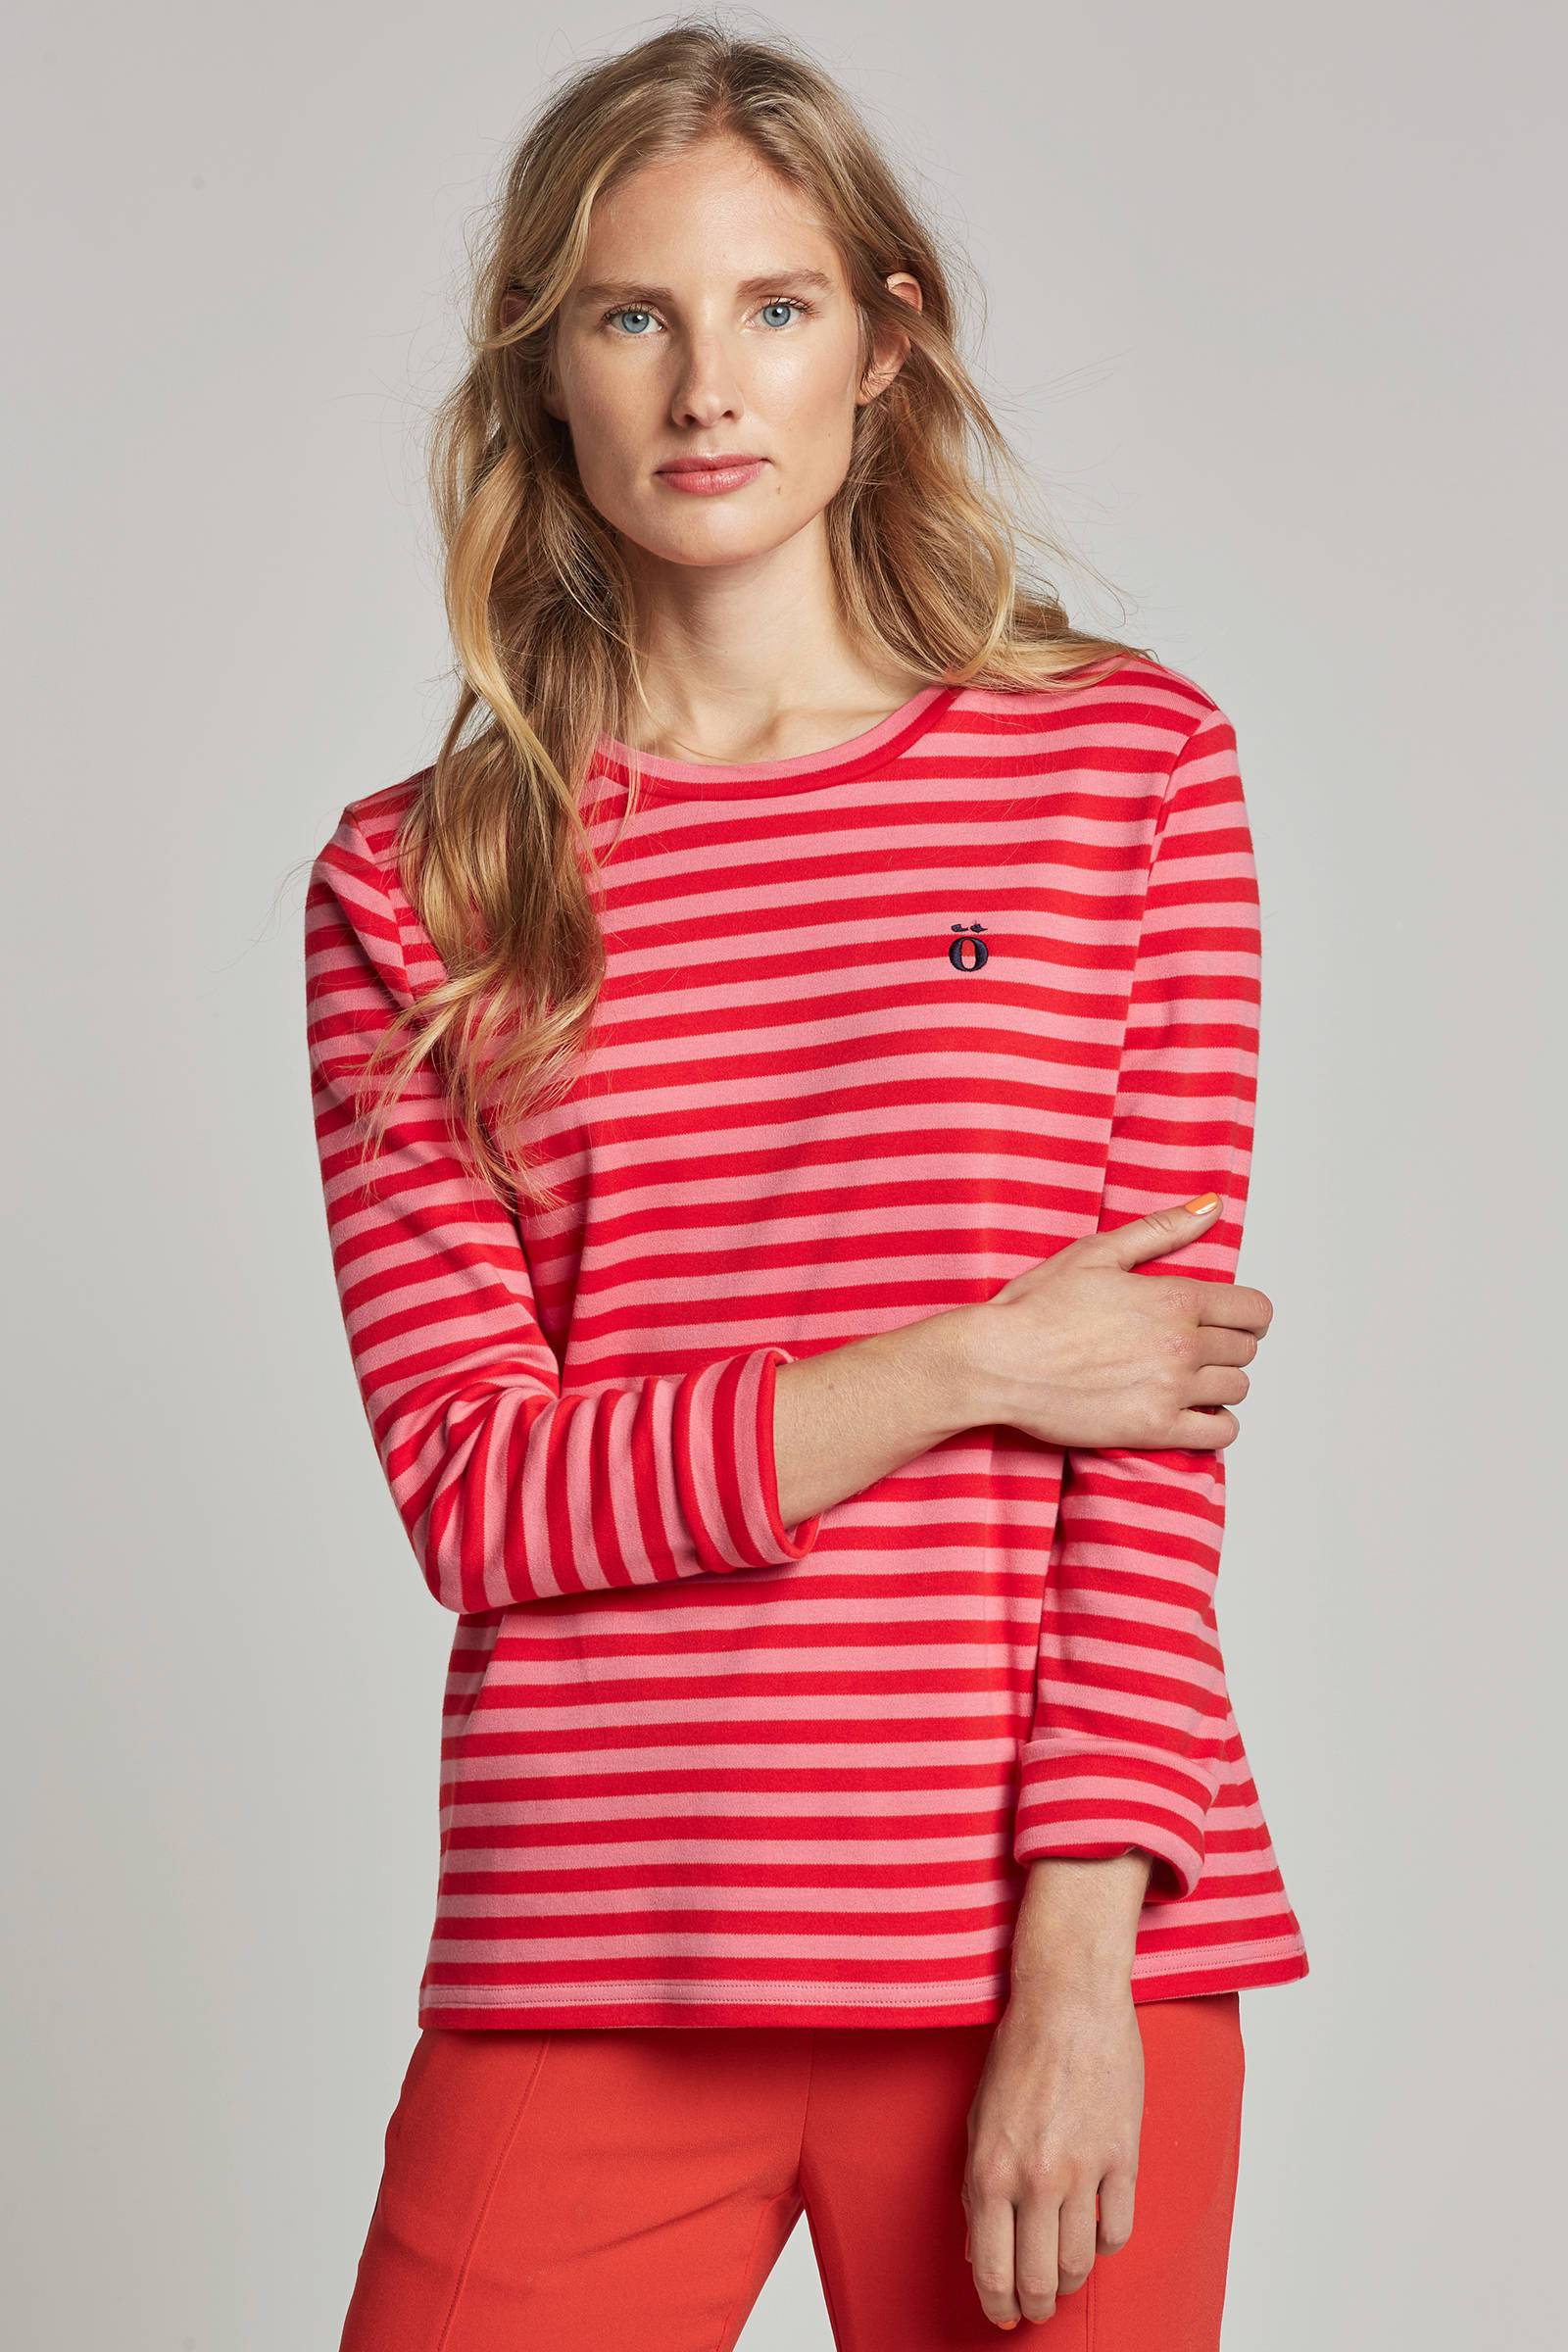 modstrom-noir-t-shirt-met-streepdessin-roze-5711592919803